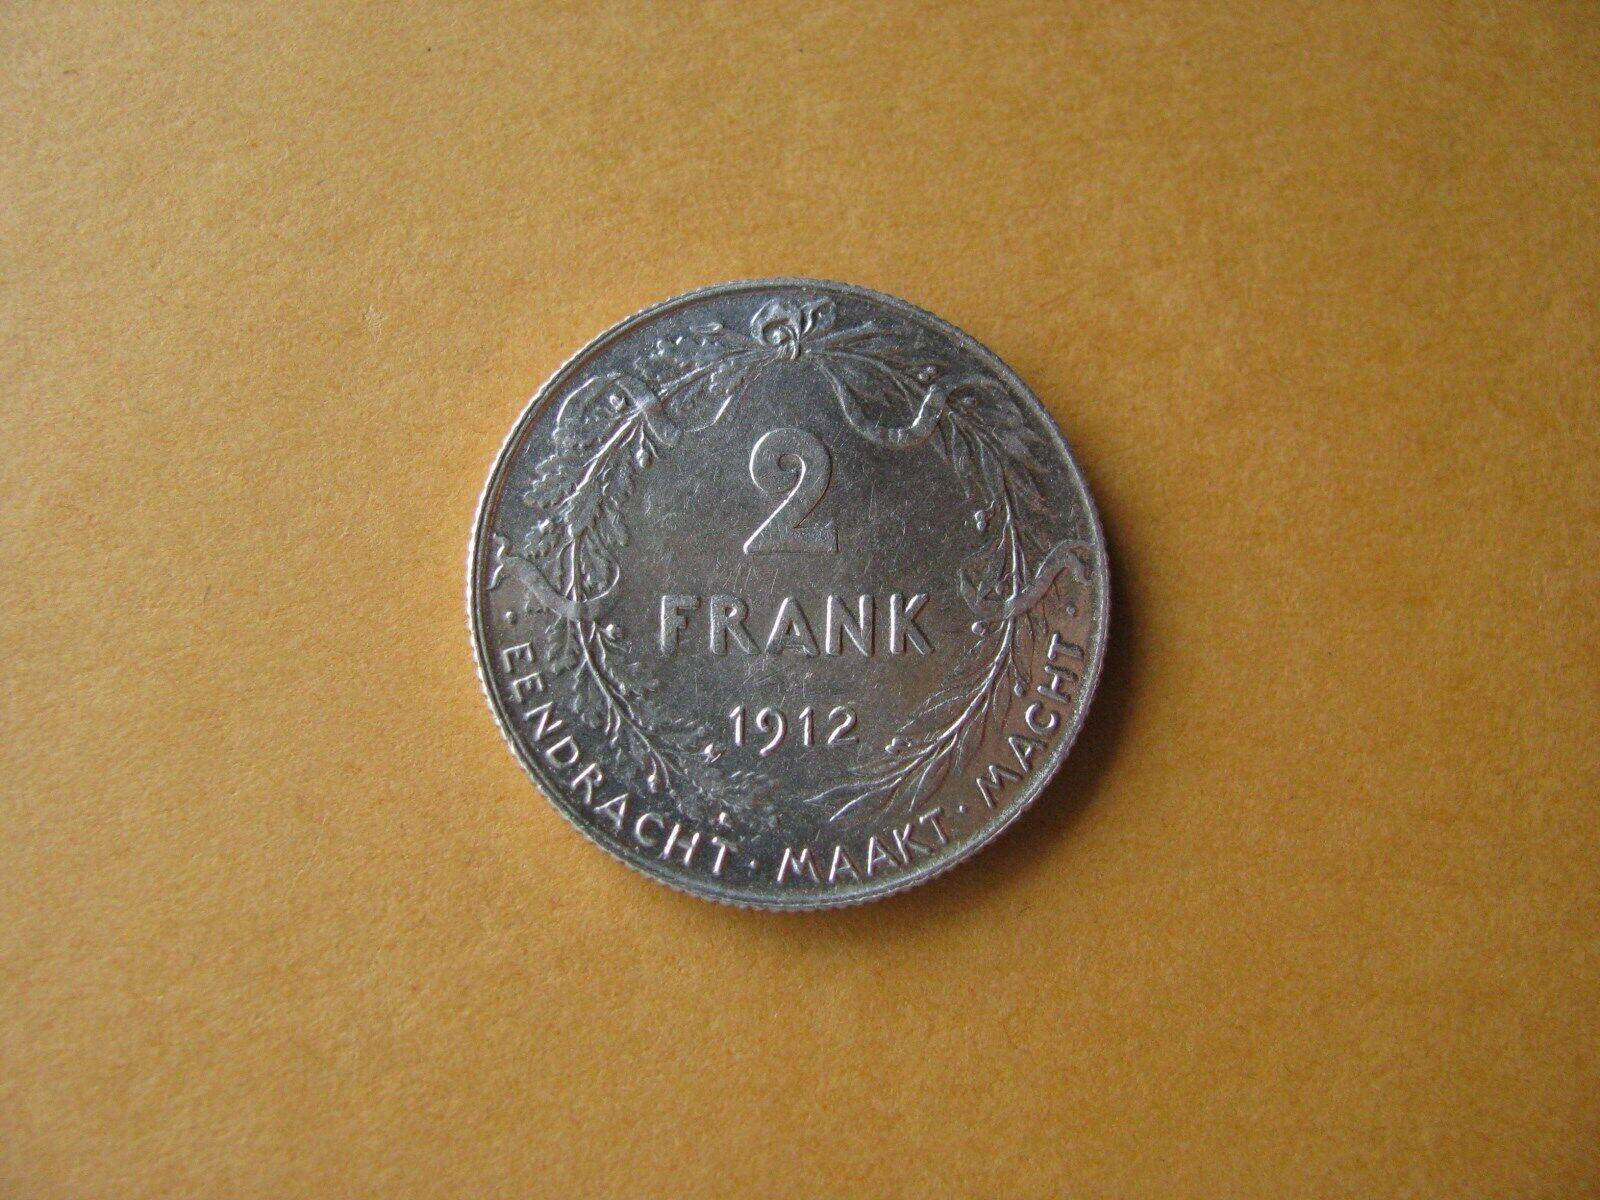 2 Francs, Albert I en néerlandais 1912-TTB+/superbe.